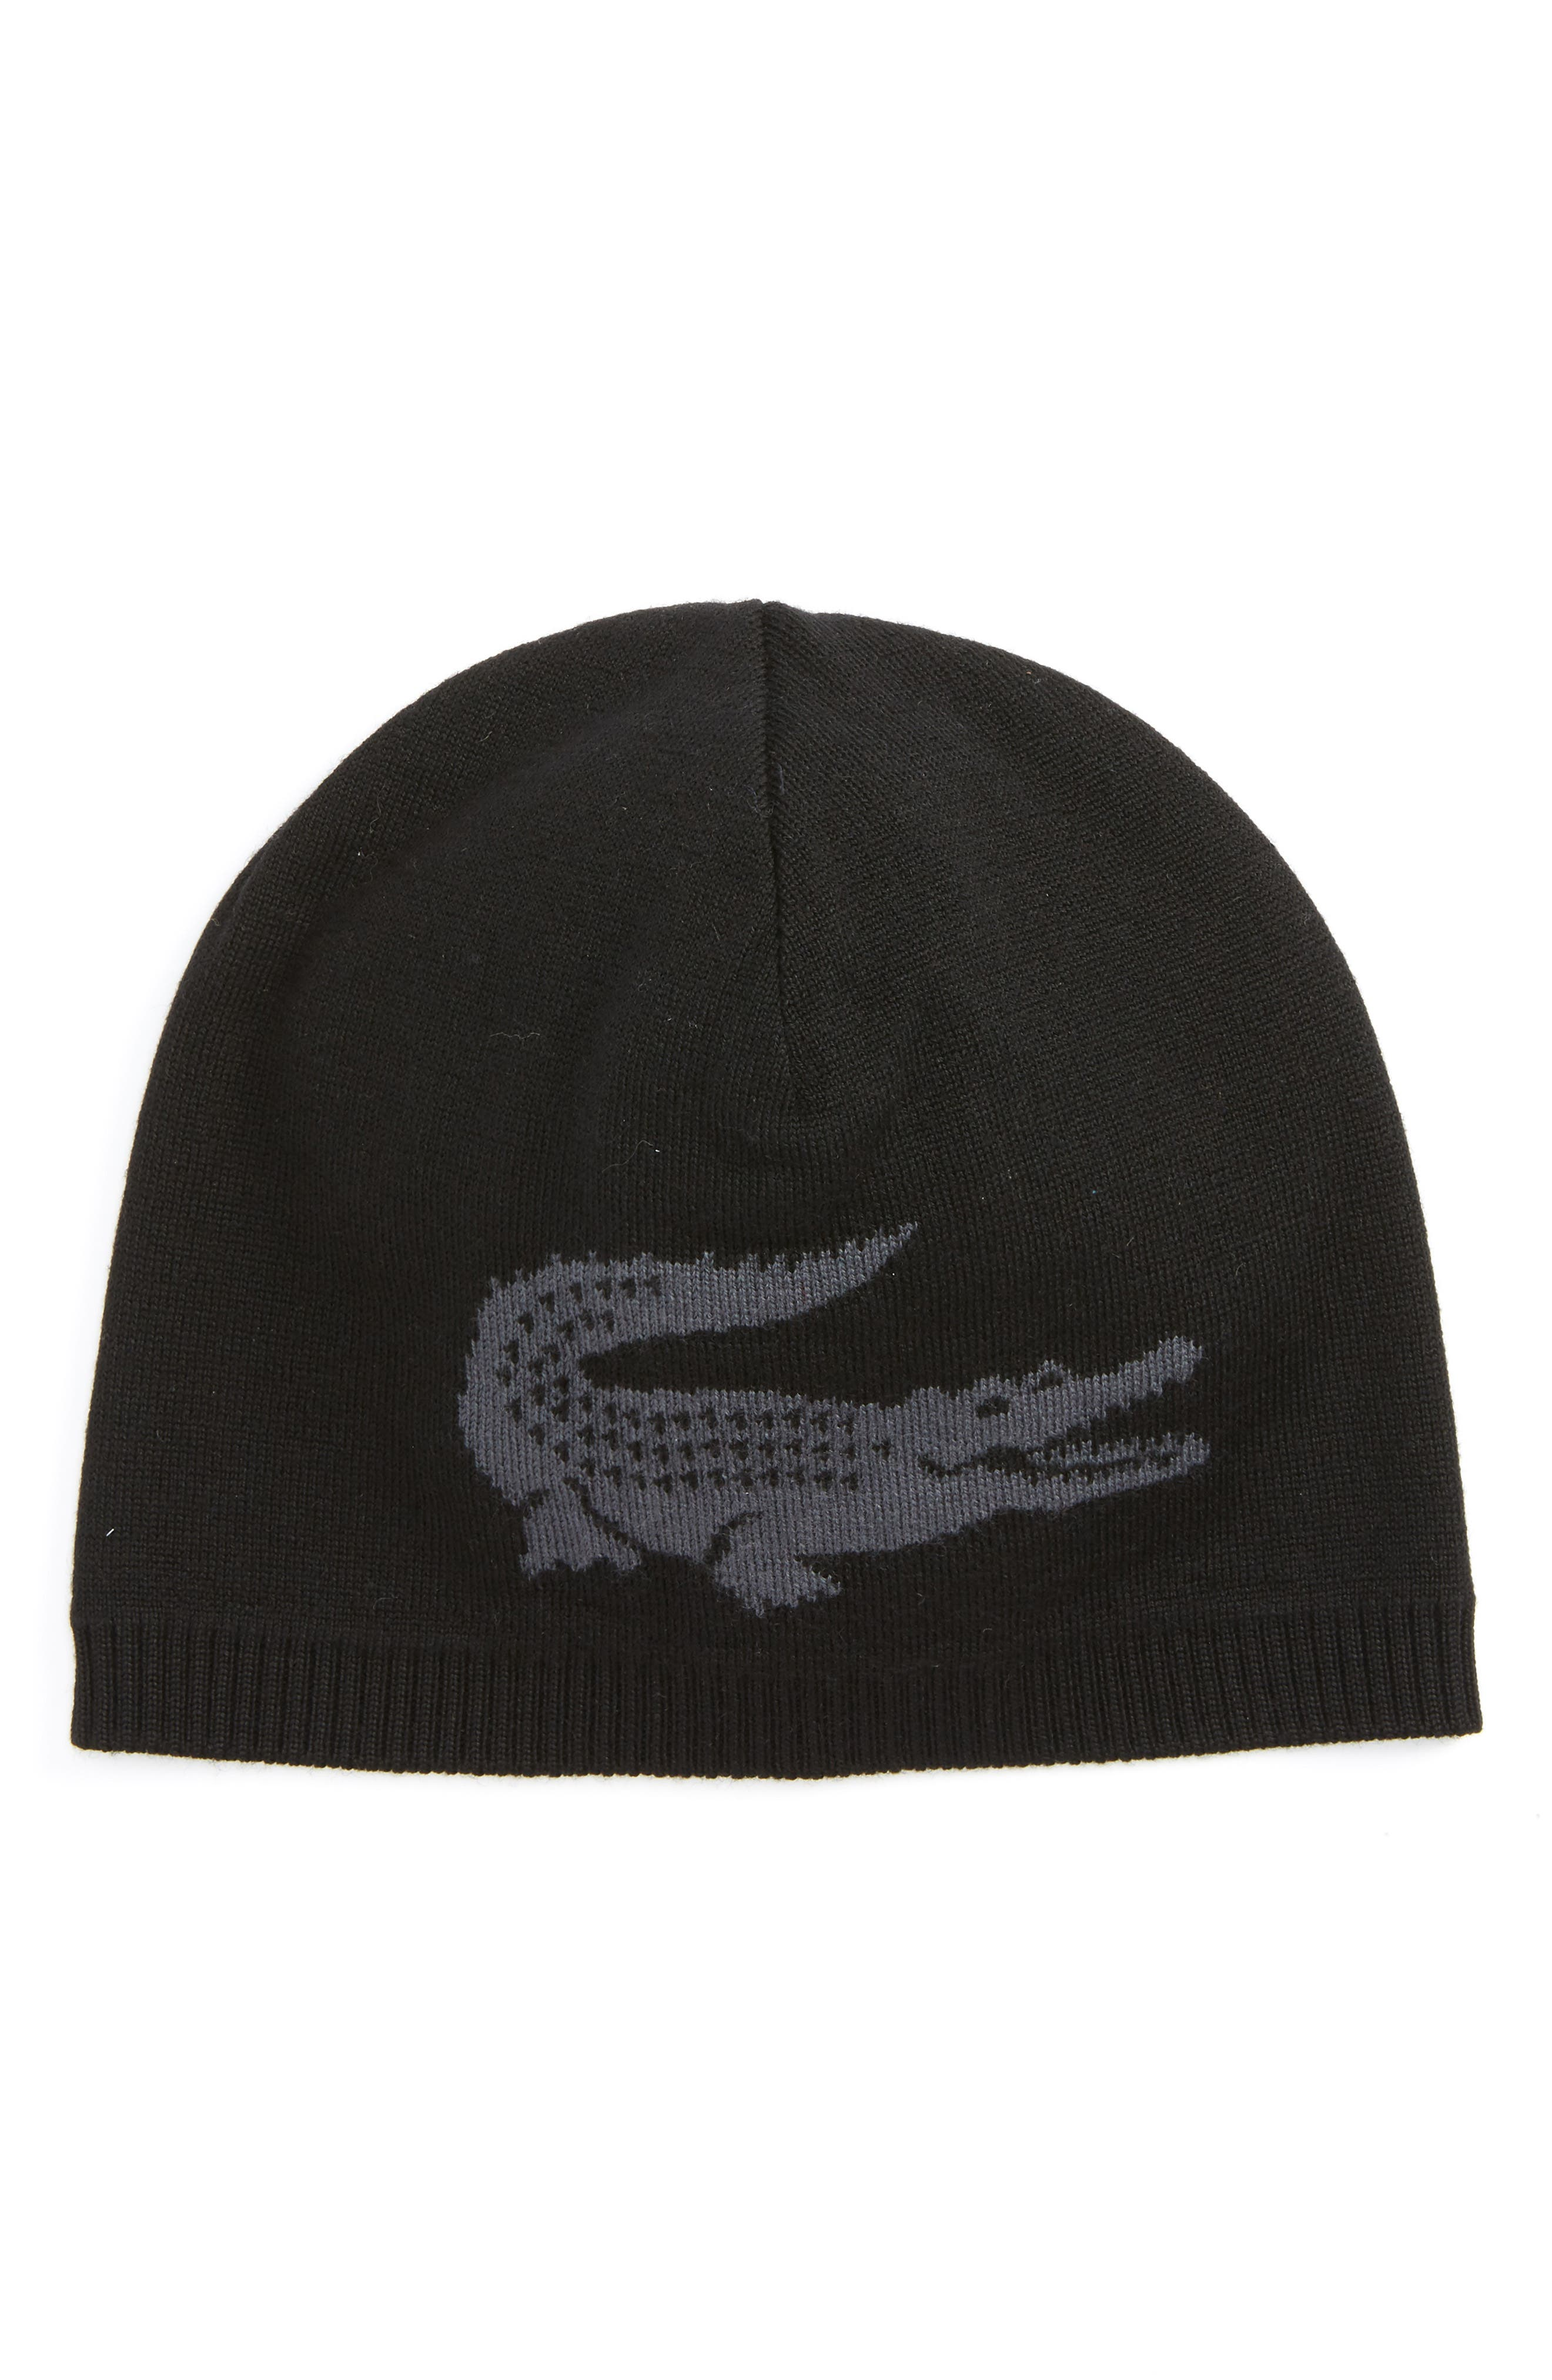 Lacoste Big Crocodile Wool Beanie